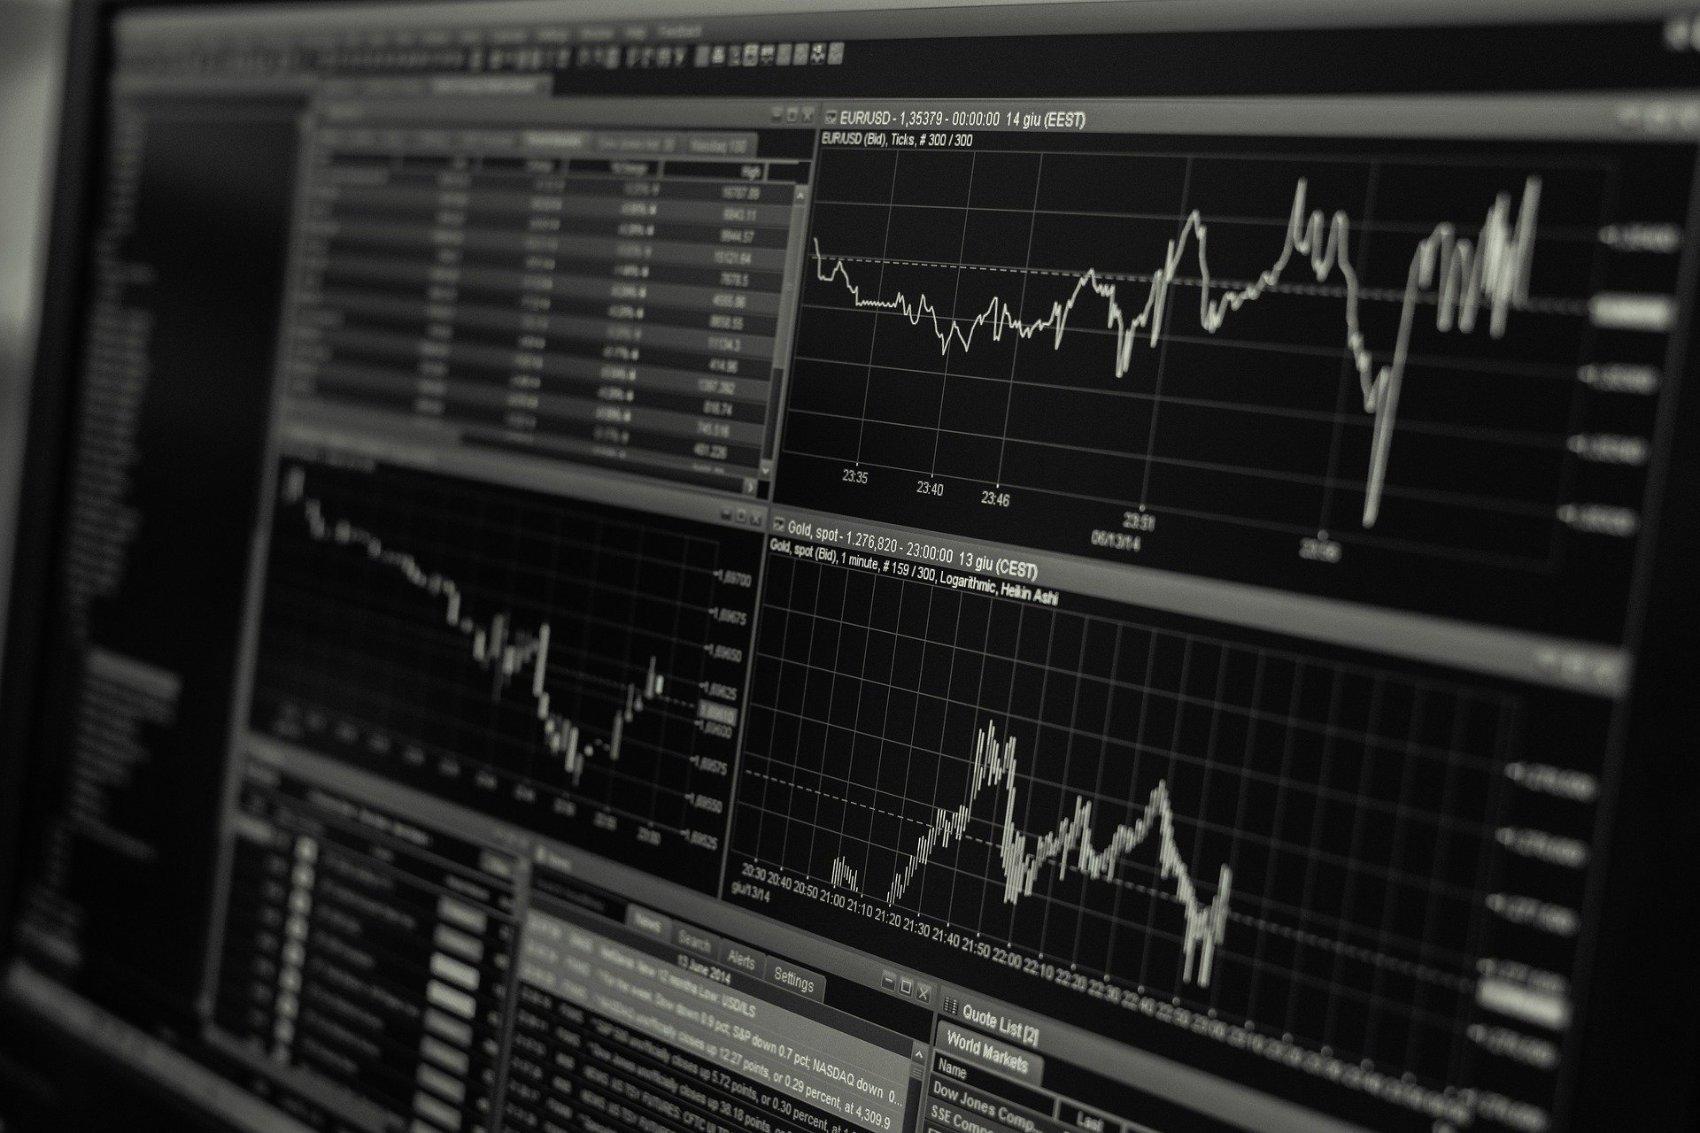 Stock Trading Monitor - Image by Lorenzo Cafaro